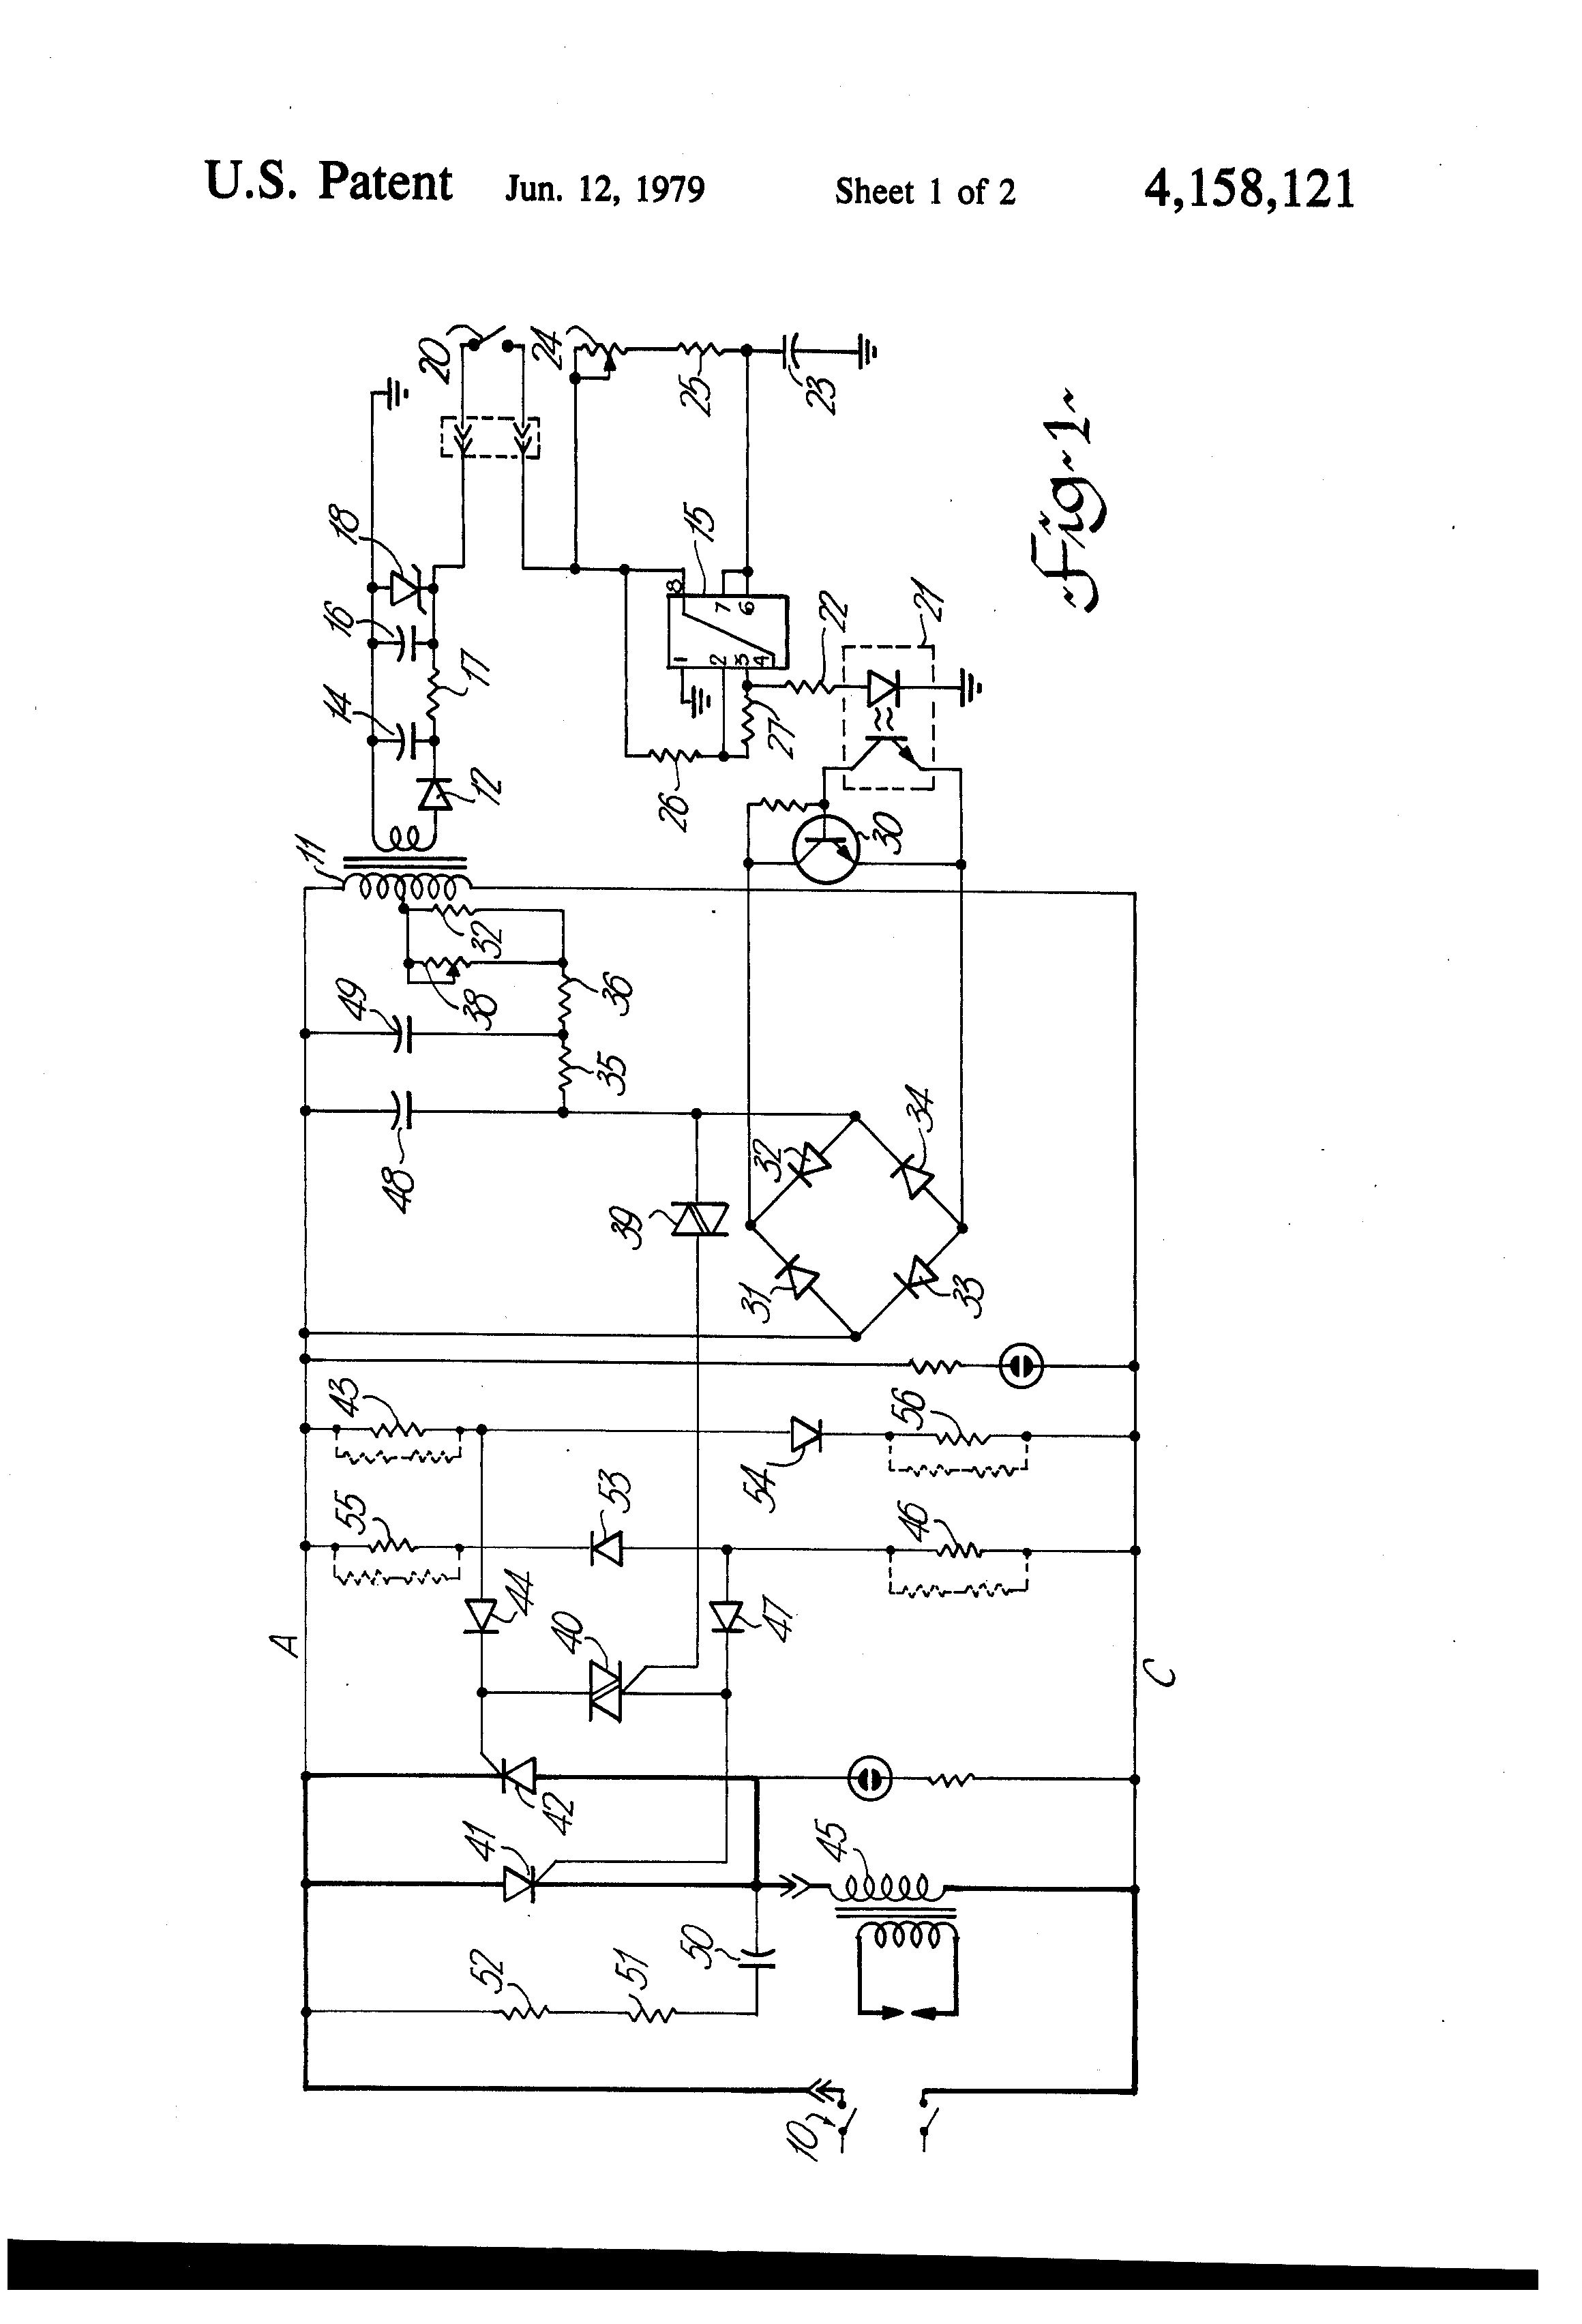 welding inverter circuit diagram patent us4158121 - spot welder control circuit - google ... #14